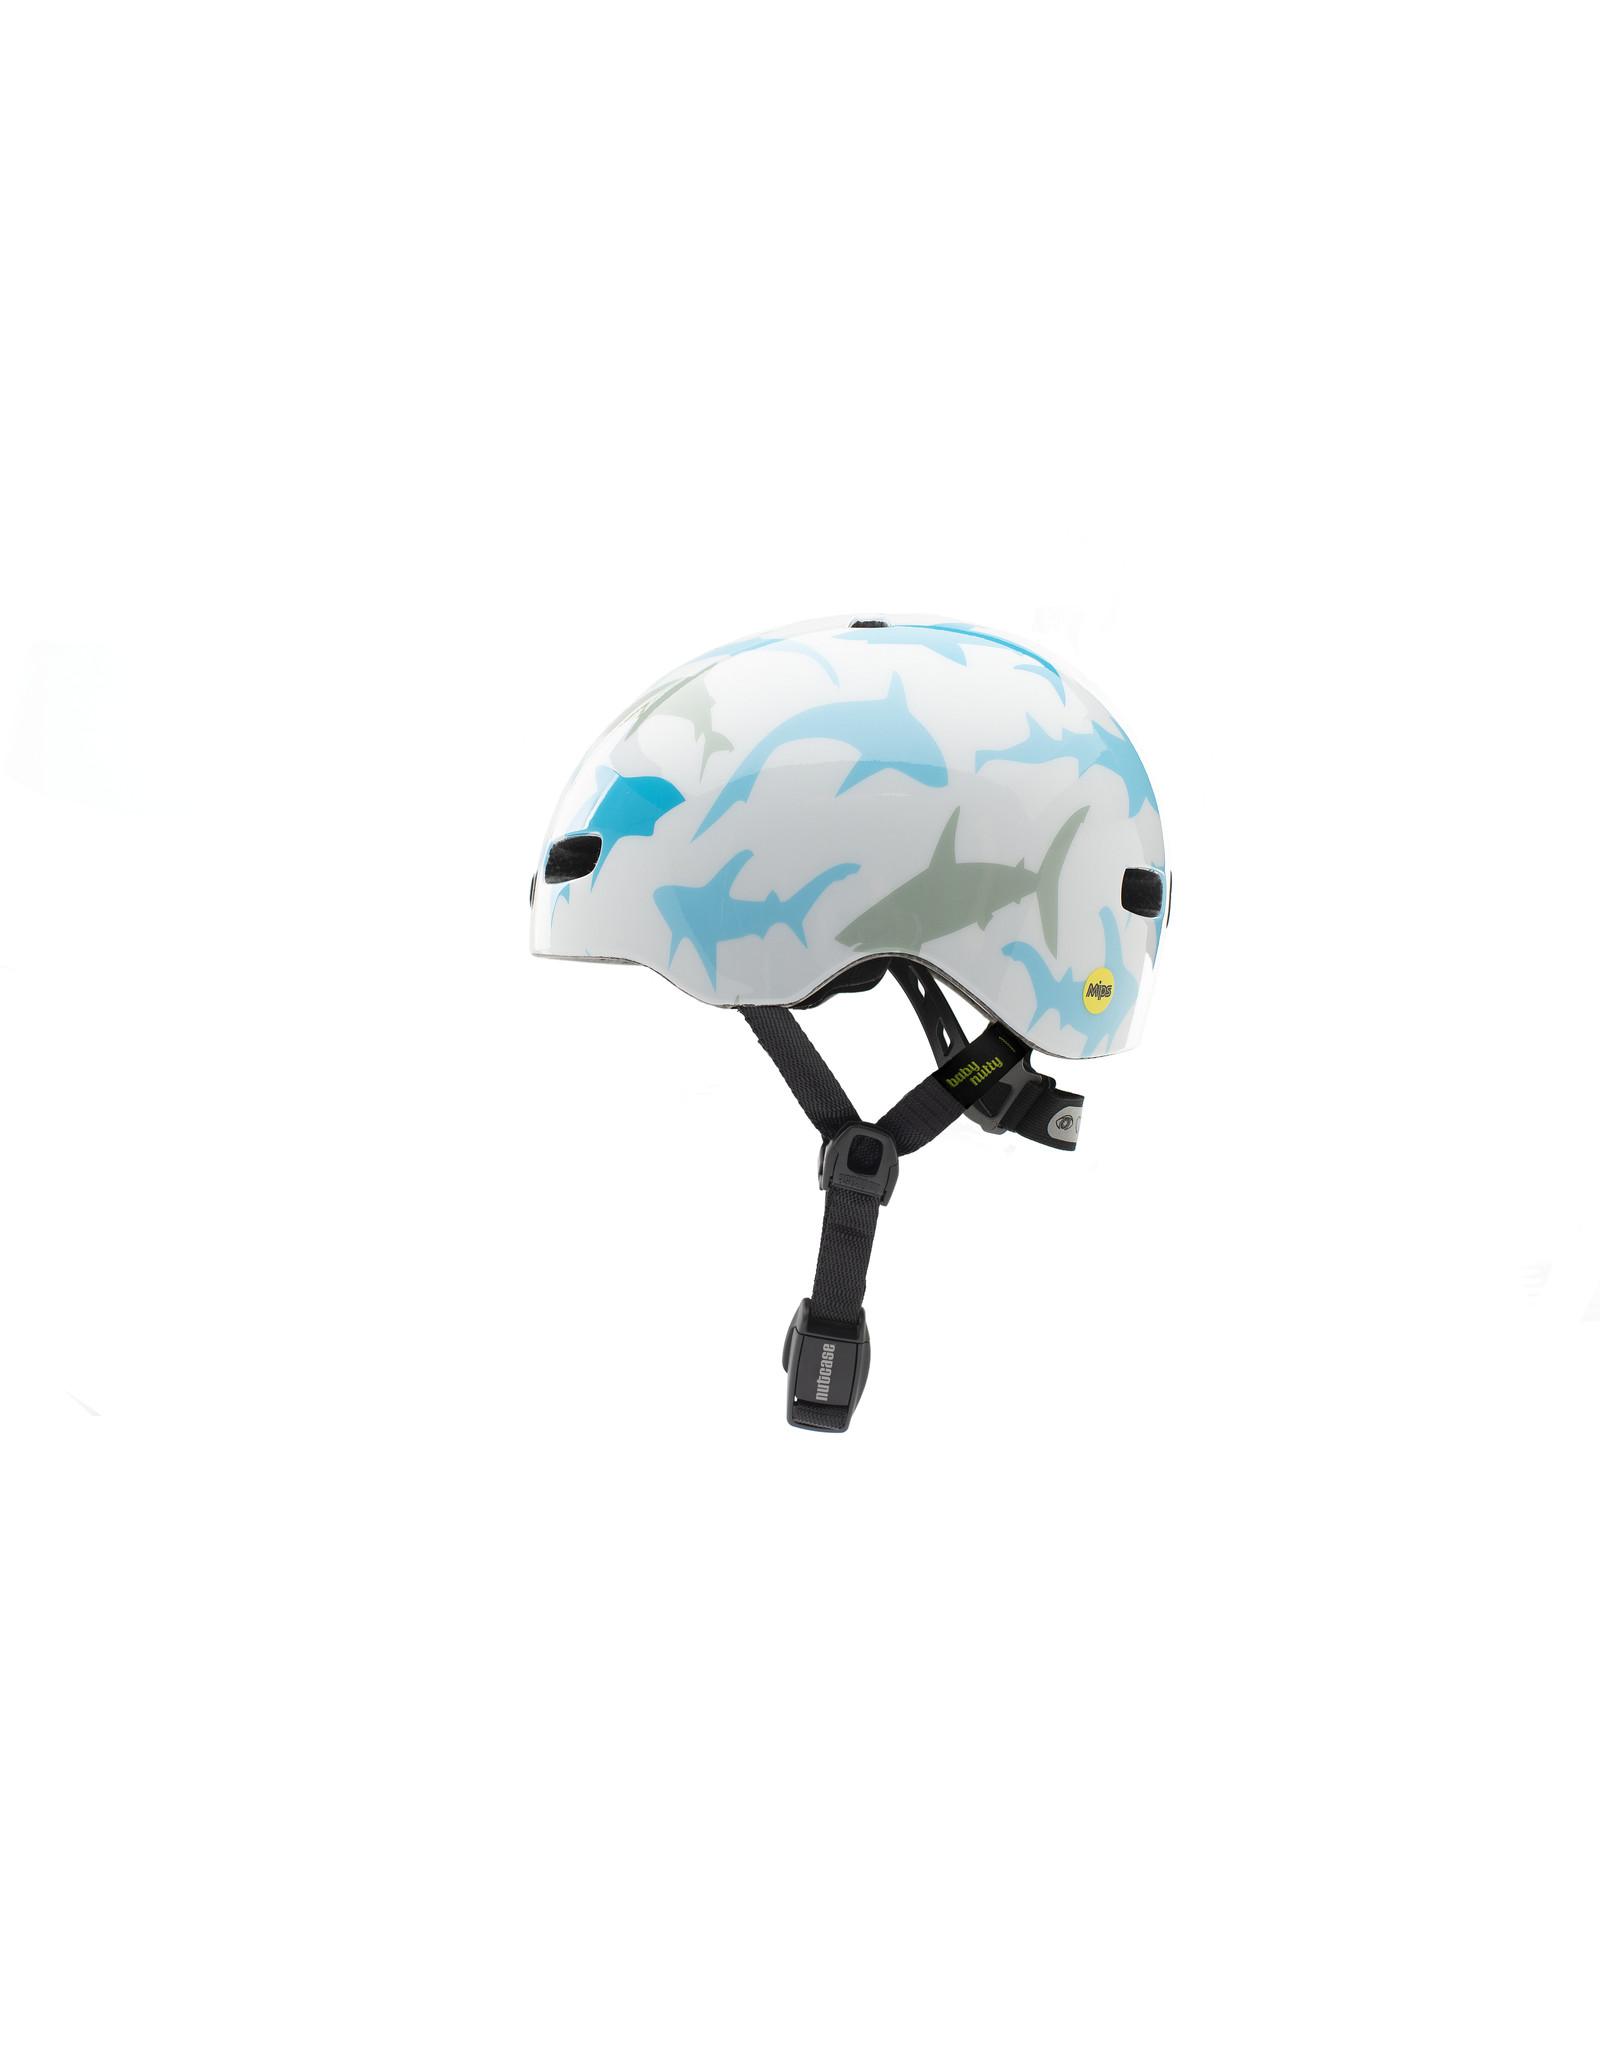 Nutcase  fietshelm  Baby Nutty Baby Shark Gloss MIPS Helmet